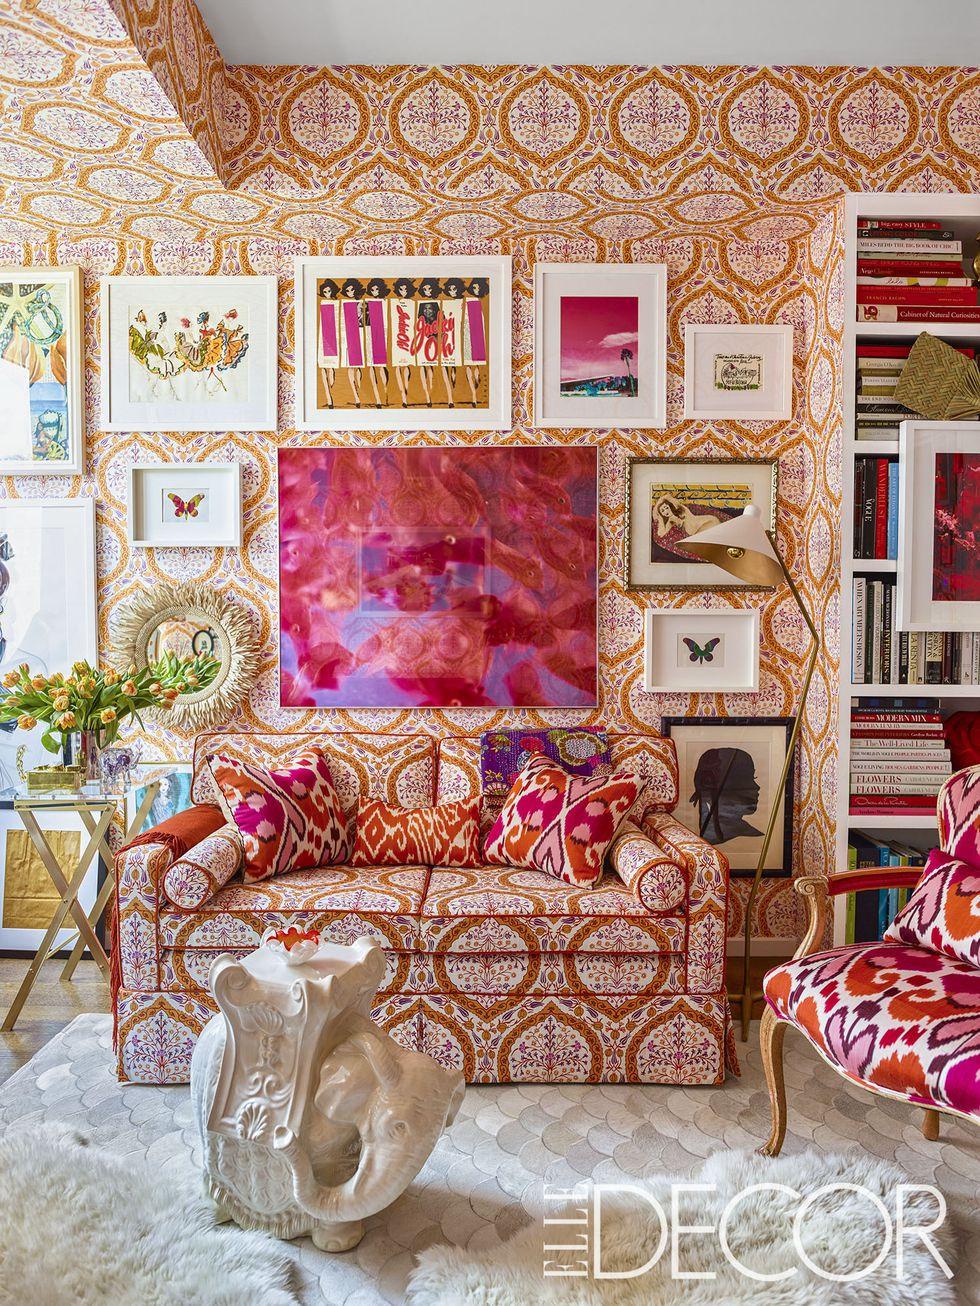 Wallpaper and fabric is by Elizabeth Hamilton, image via Elle Decor, Photo by Eric Piasecki